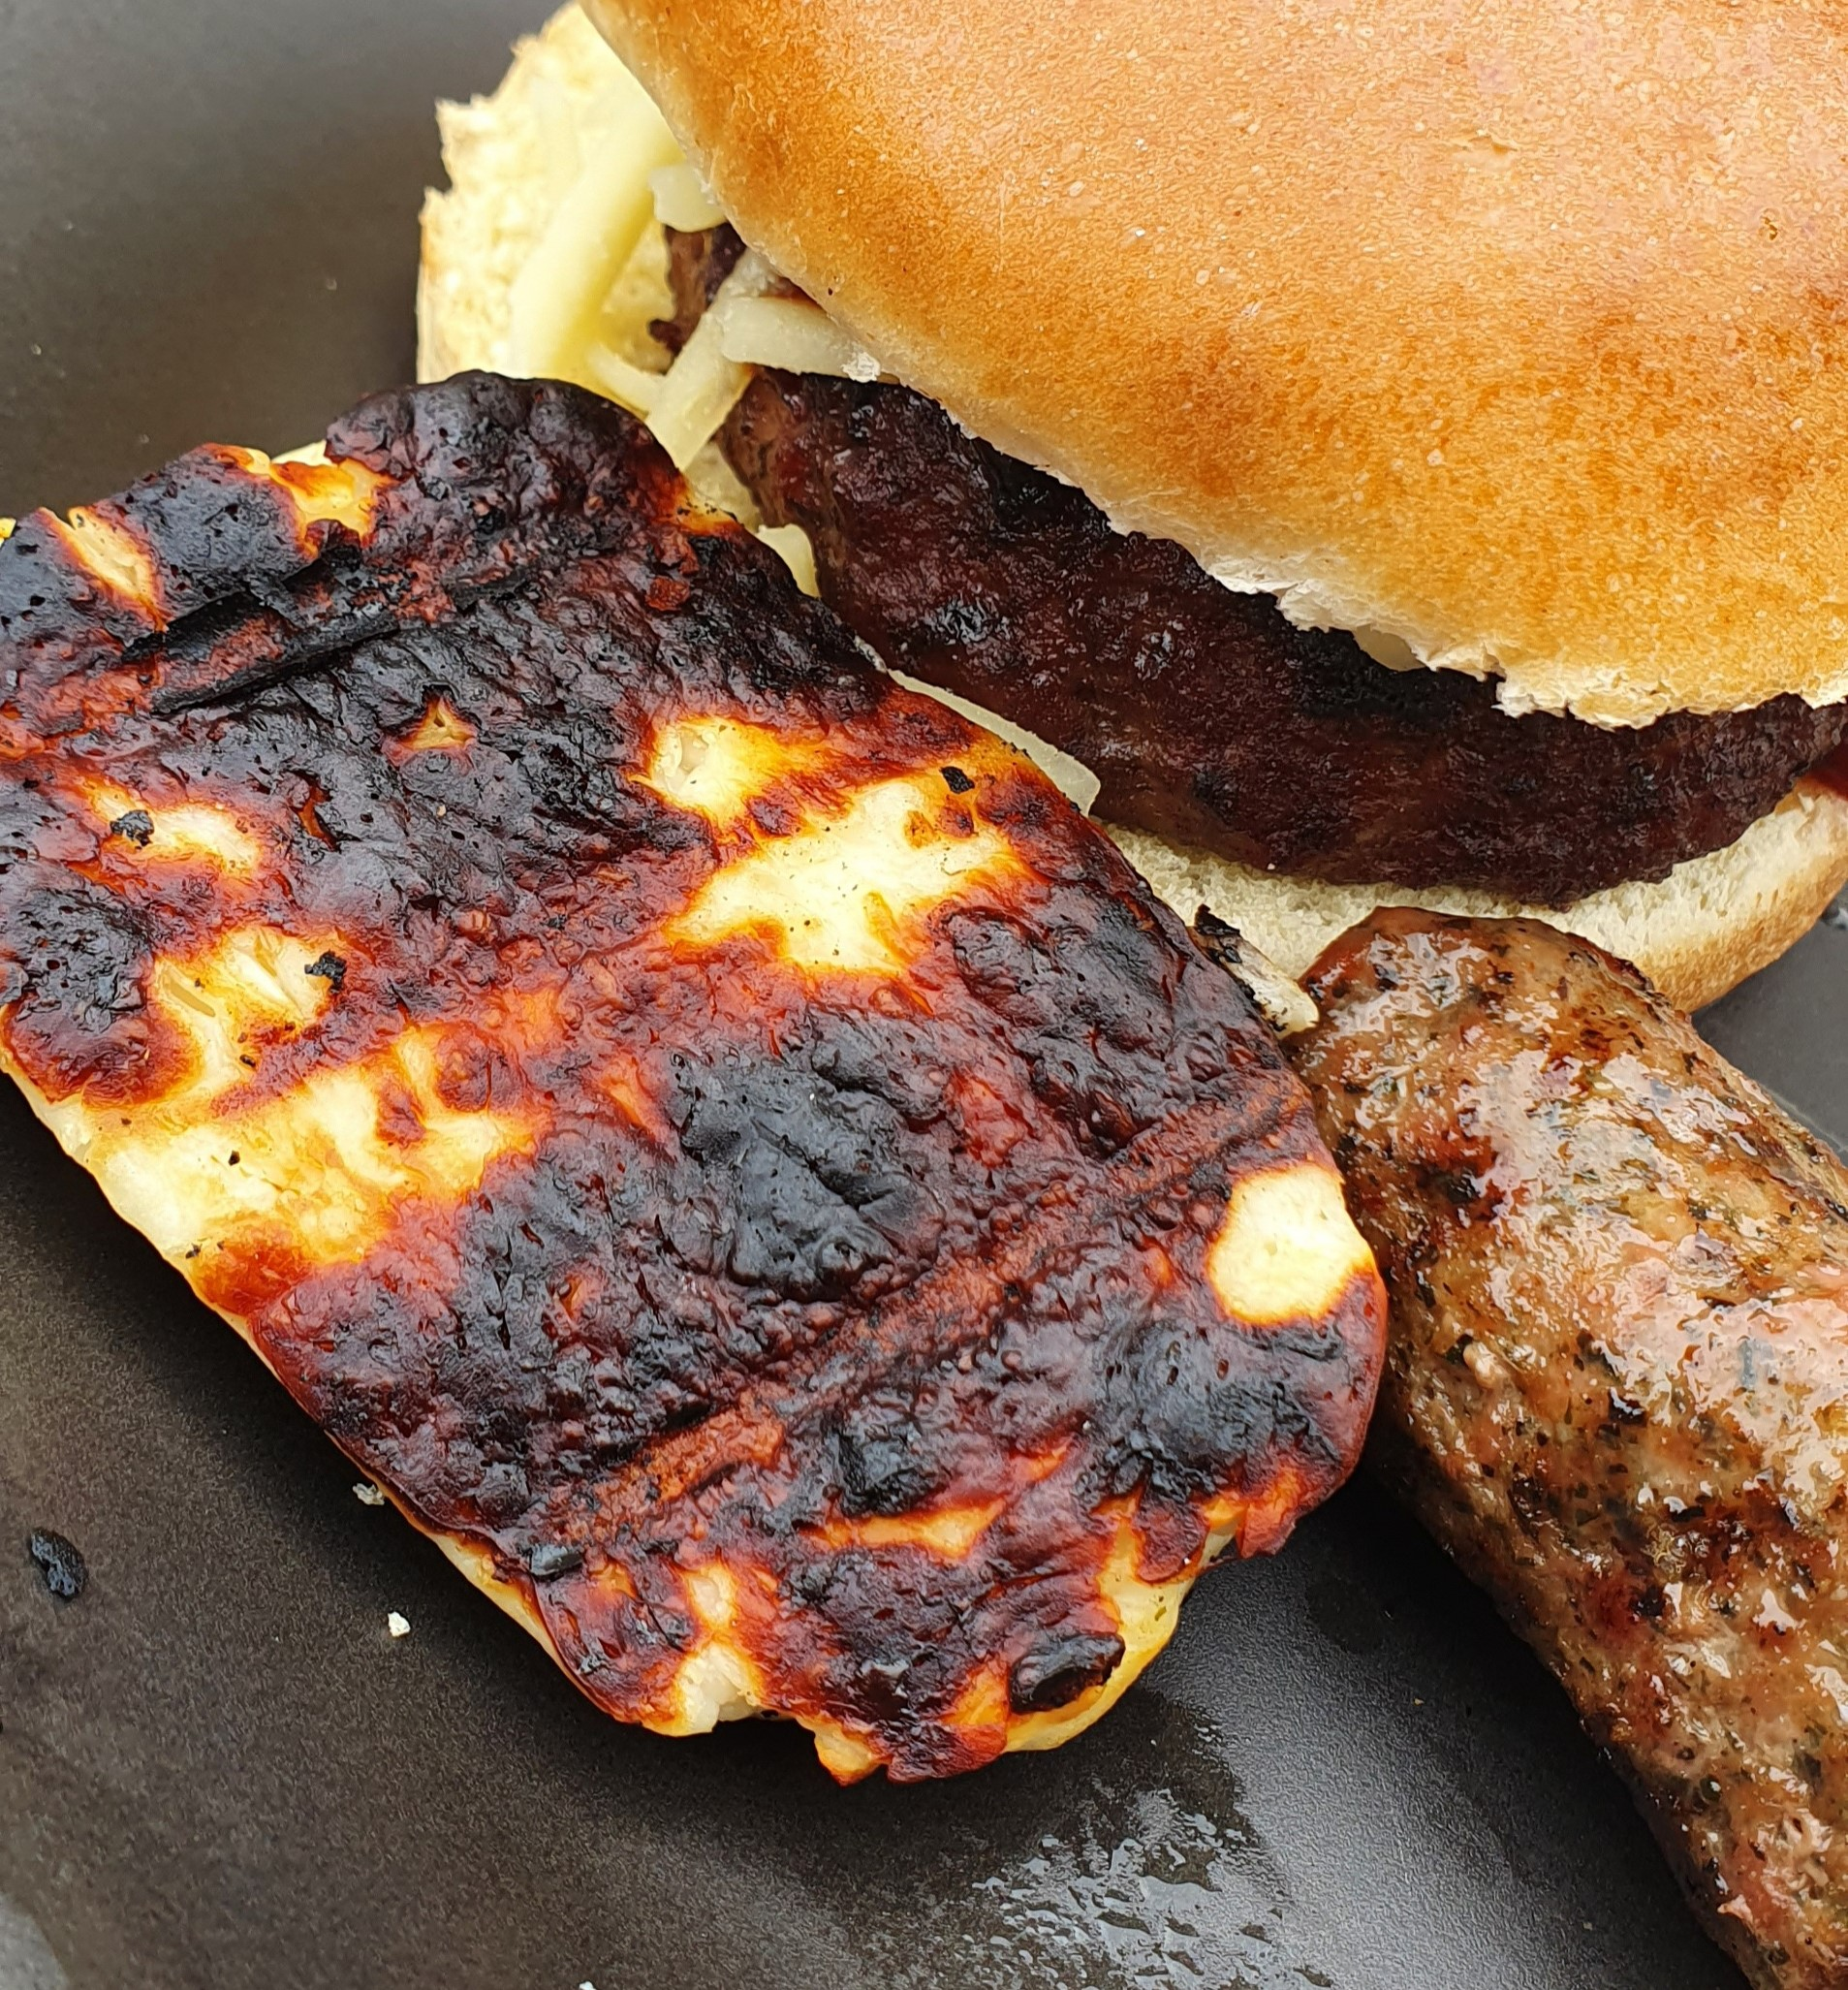 a piece of BBQ charred halloumi sat next to a burger